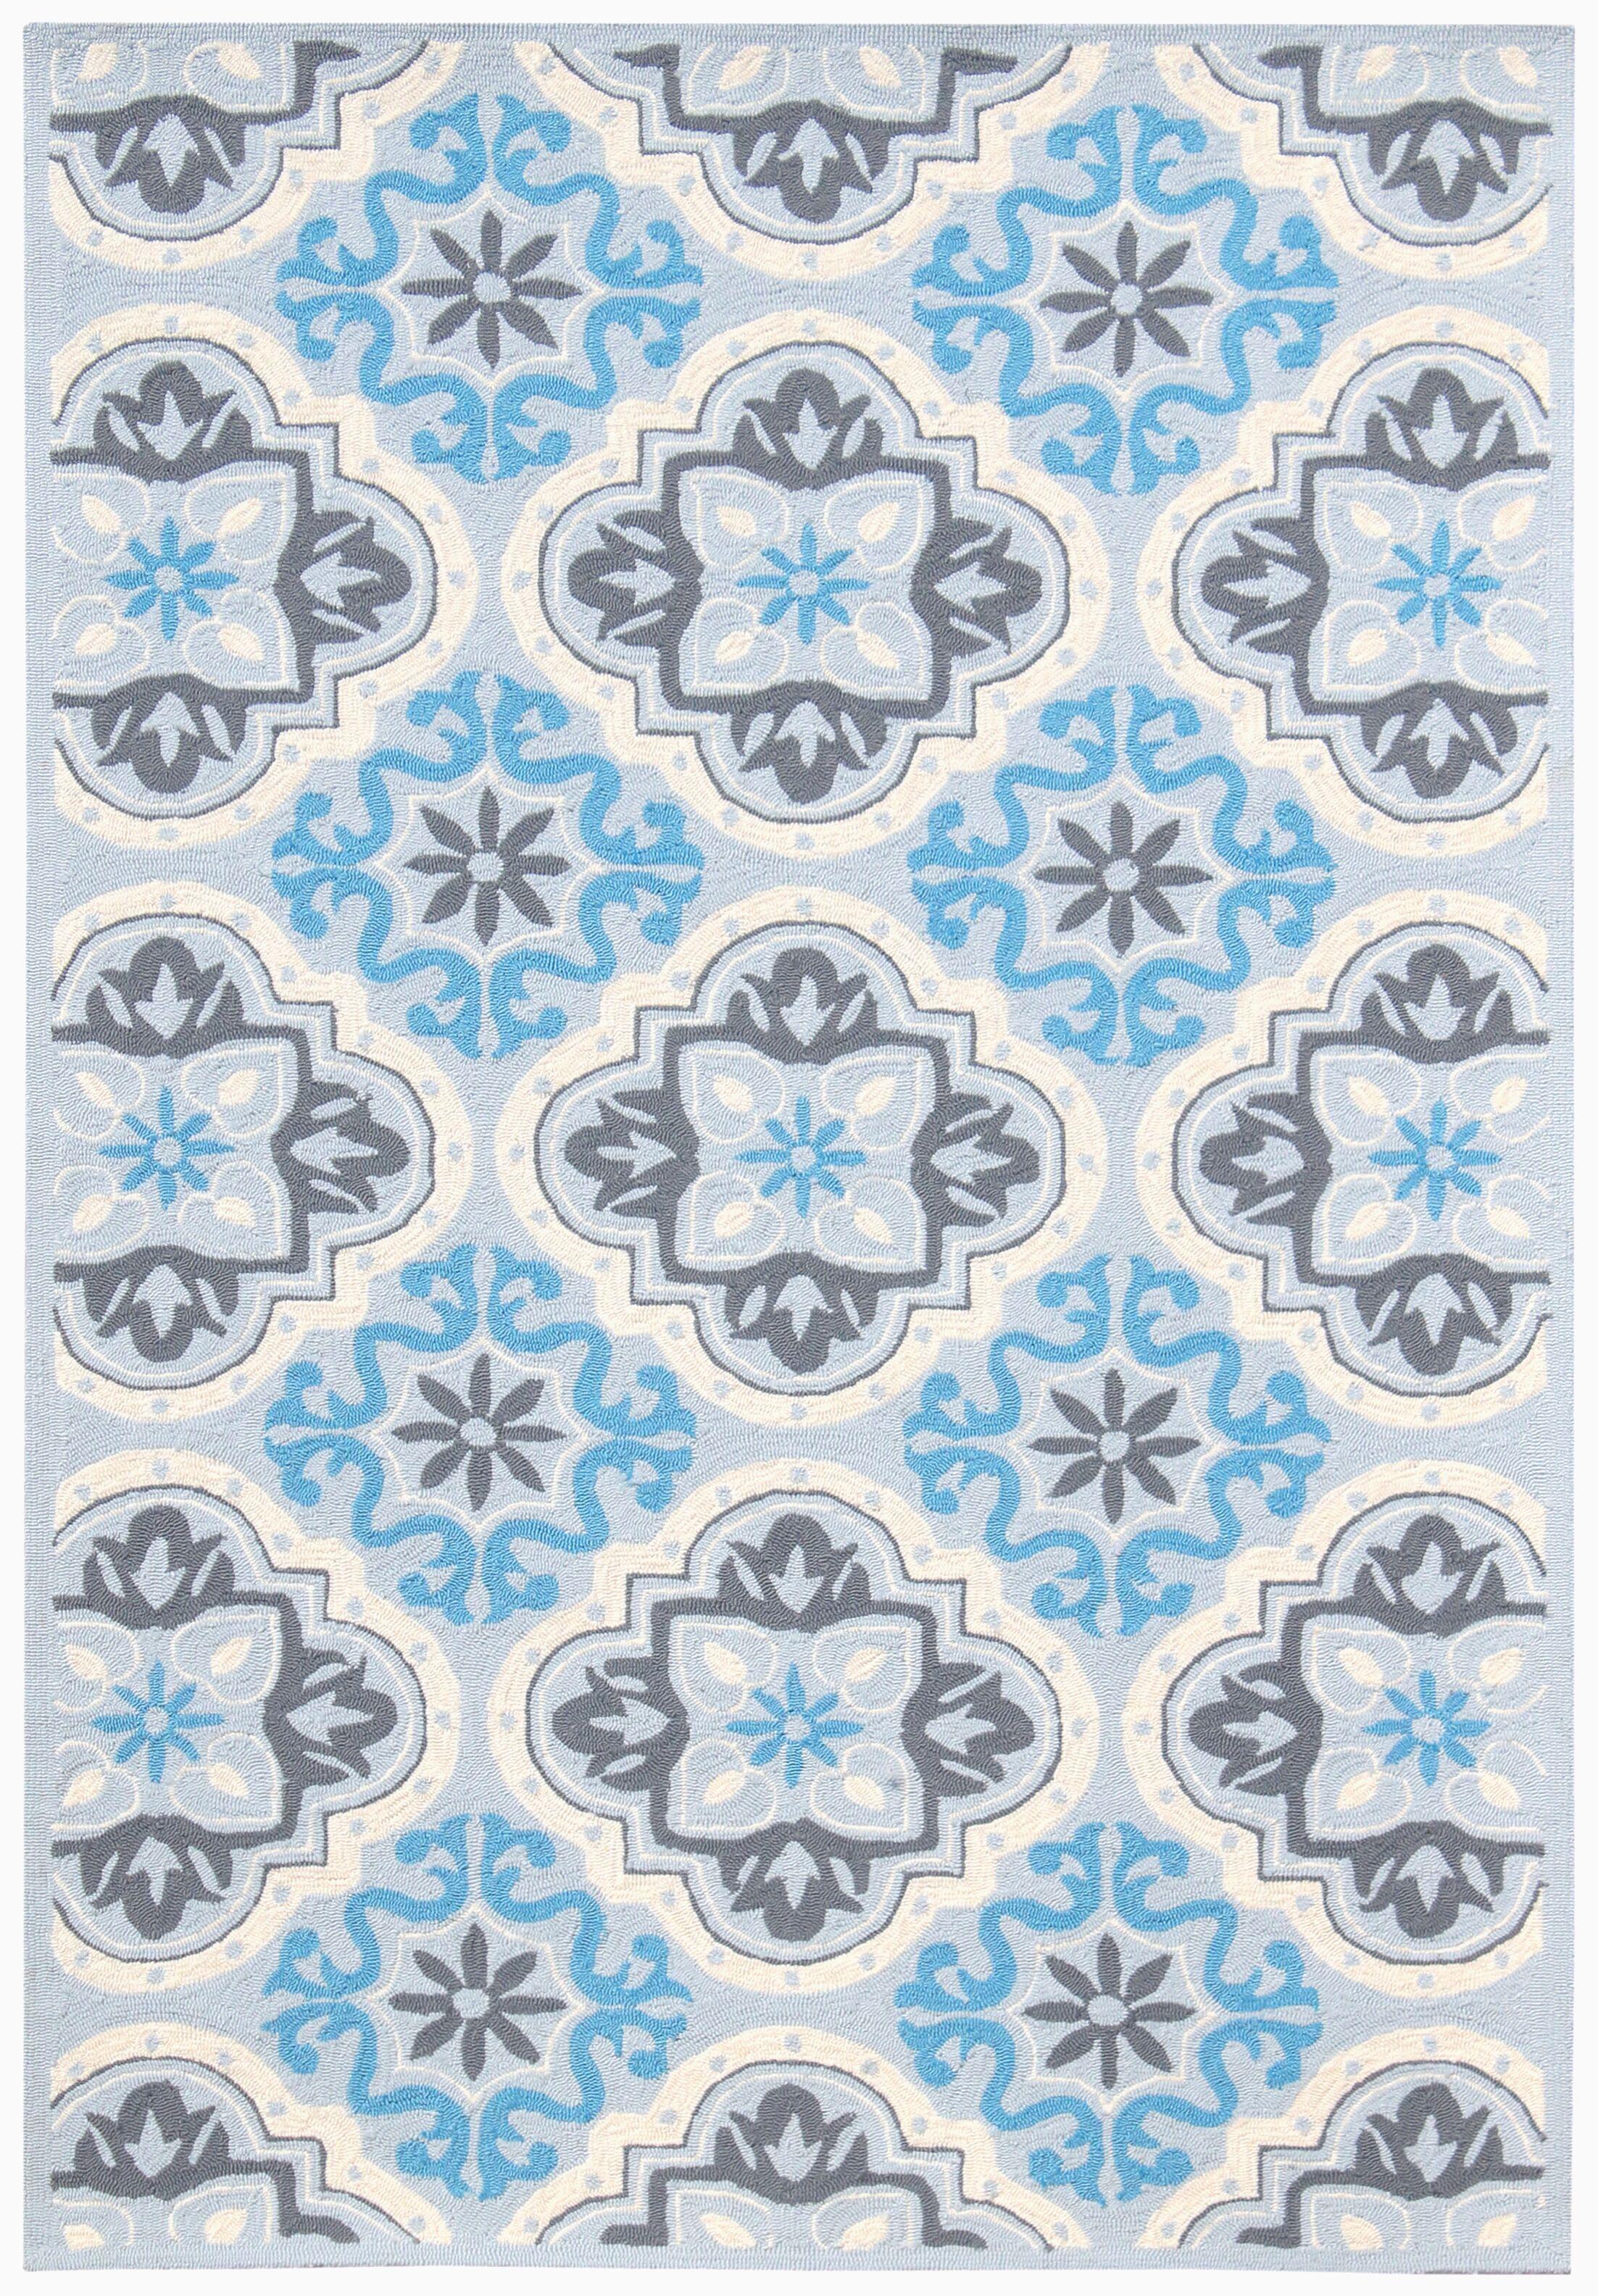 New Hartford Blue Indoor/Outdoor Area Rug Rug Size: Rectangle 5'x7'6